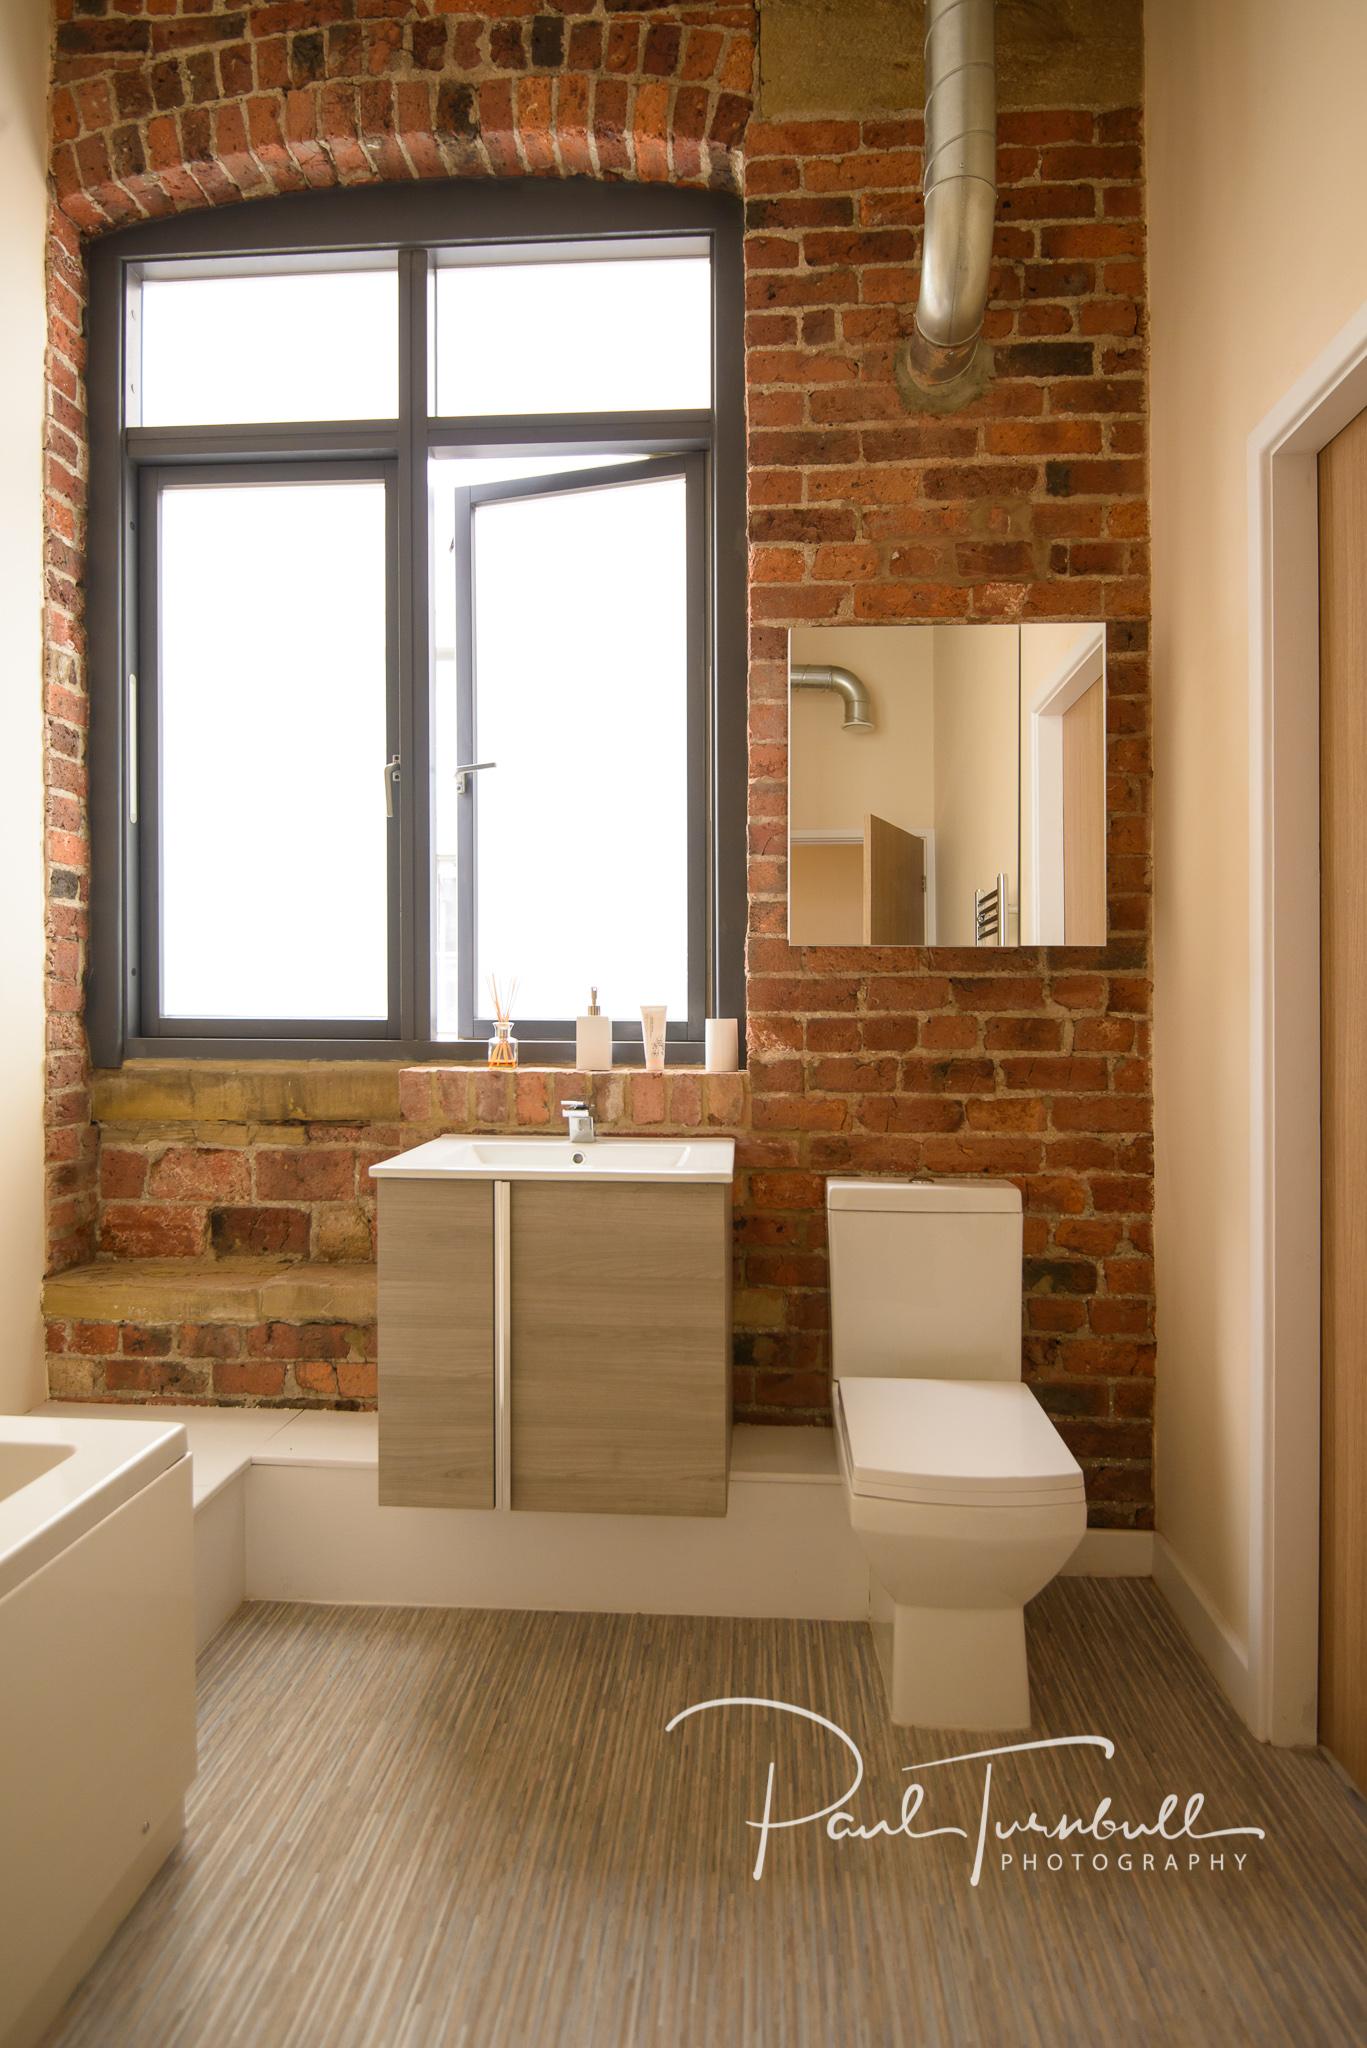 commercial-property-photographer-leeds-yorkshire-blackbrook-developments-029.jpg